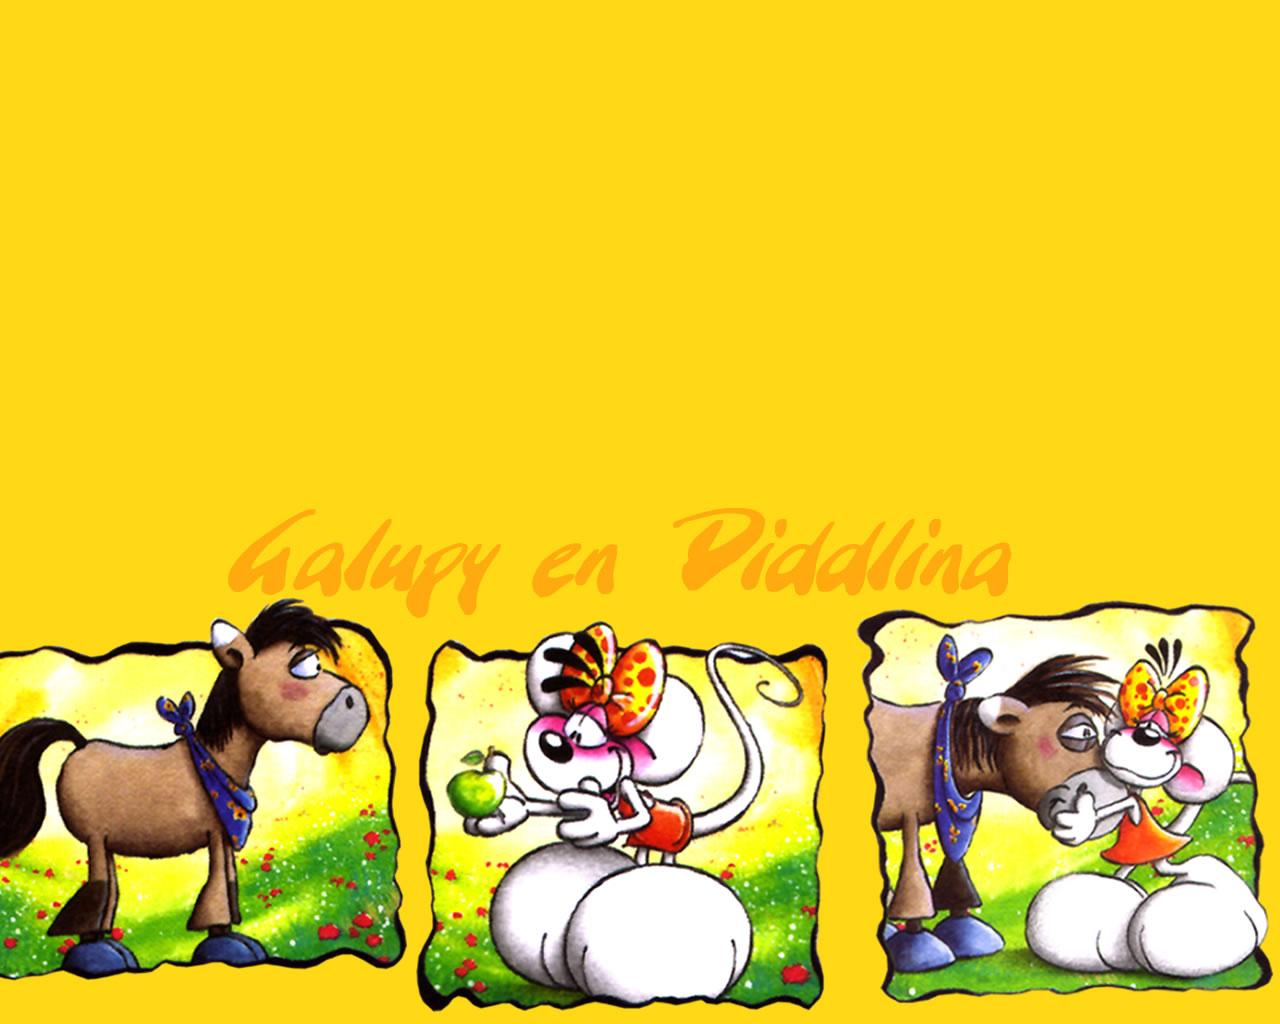 download wallpaper: Galupy en Diddlina wallpaper